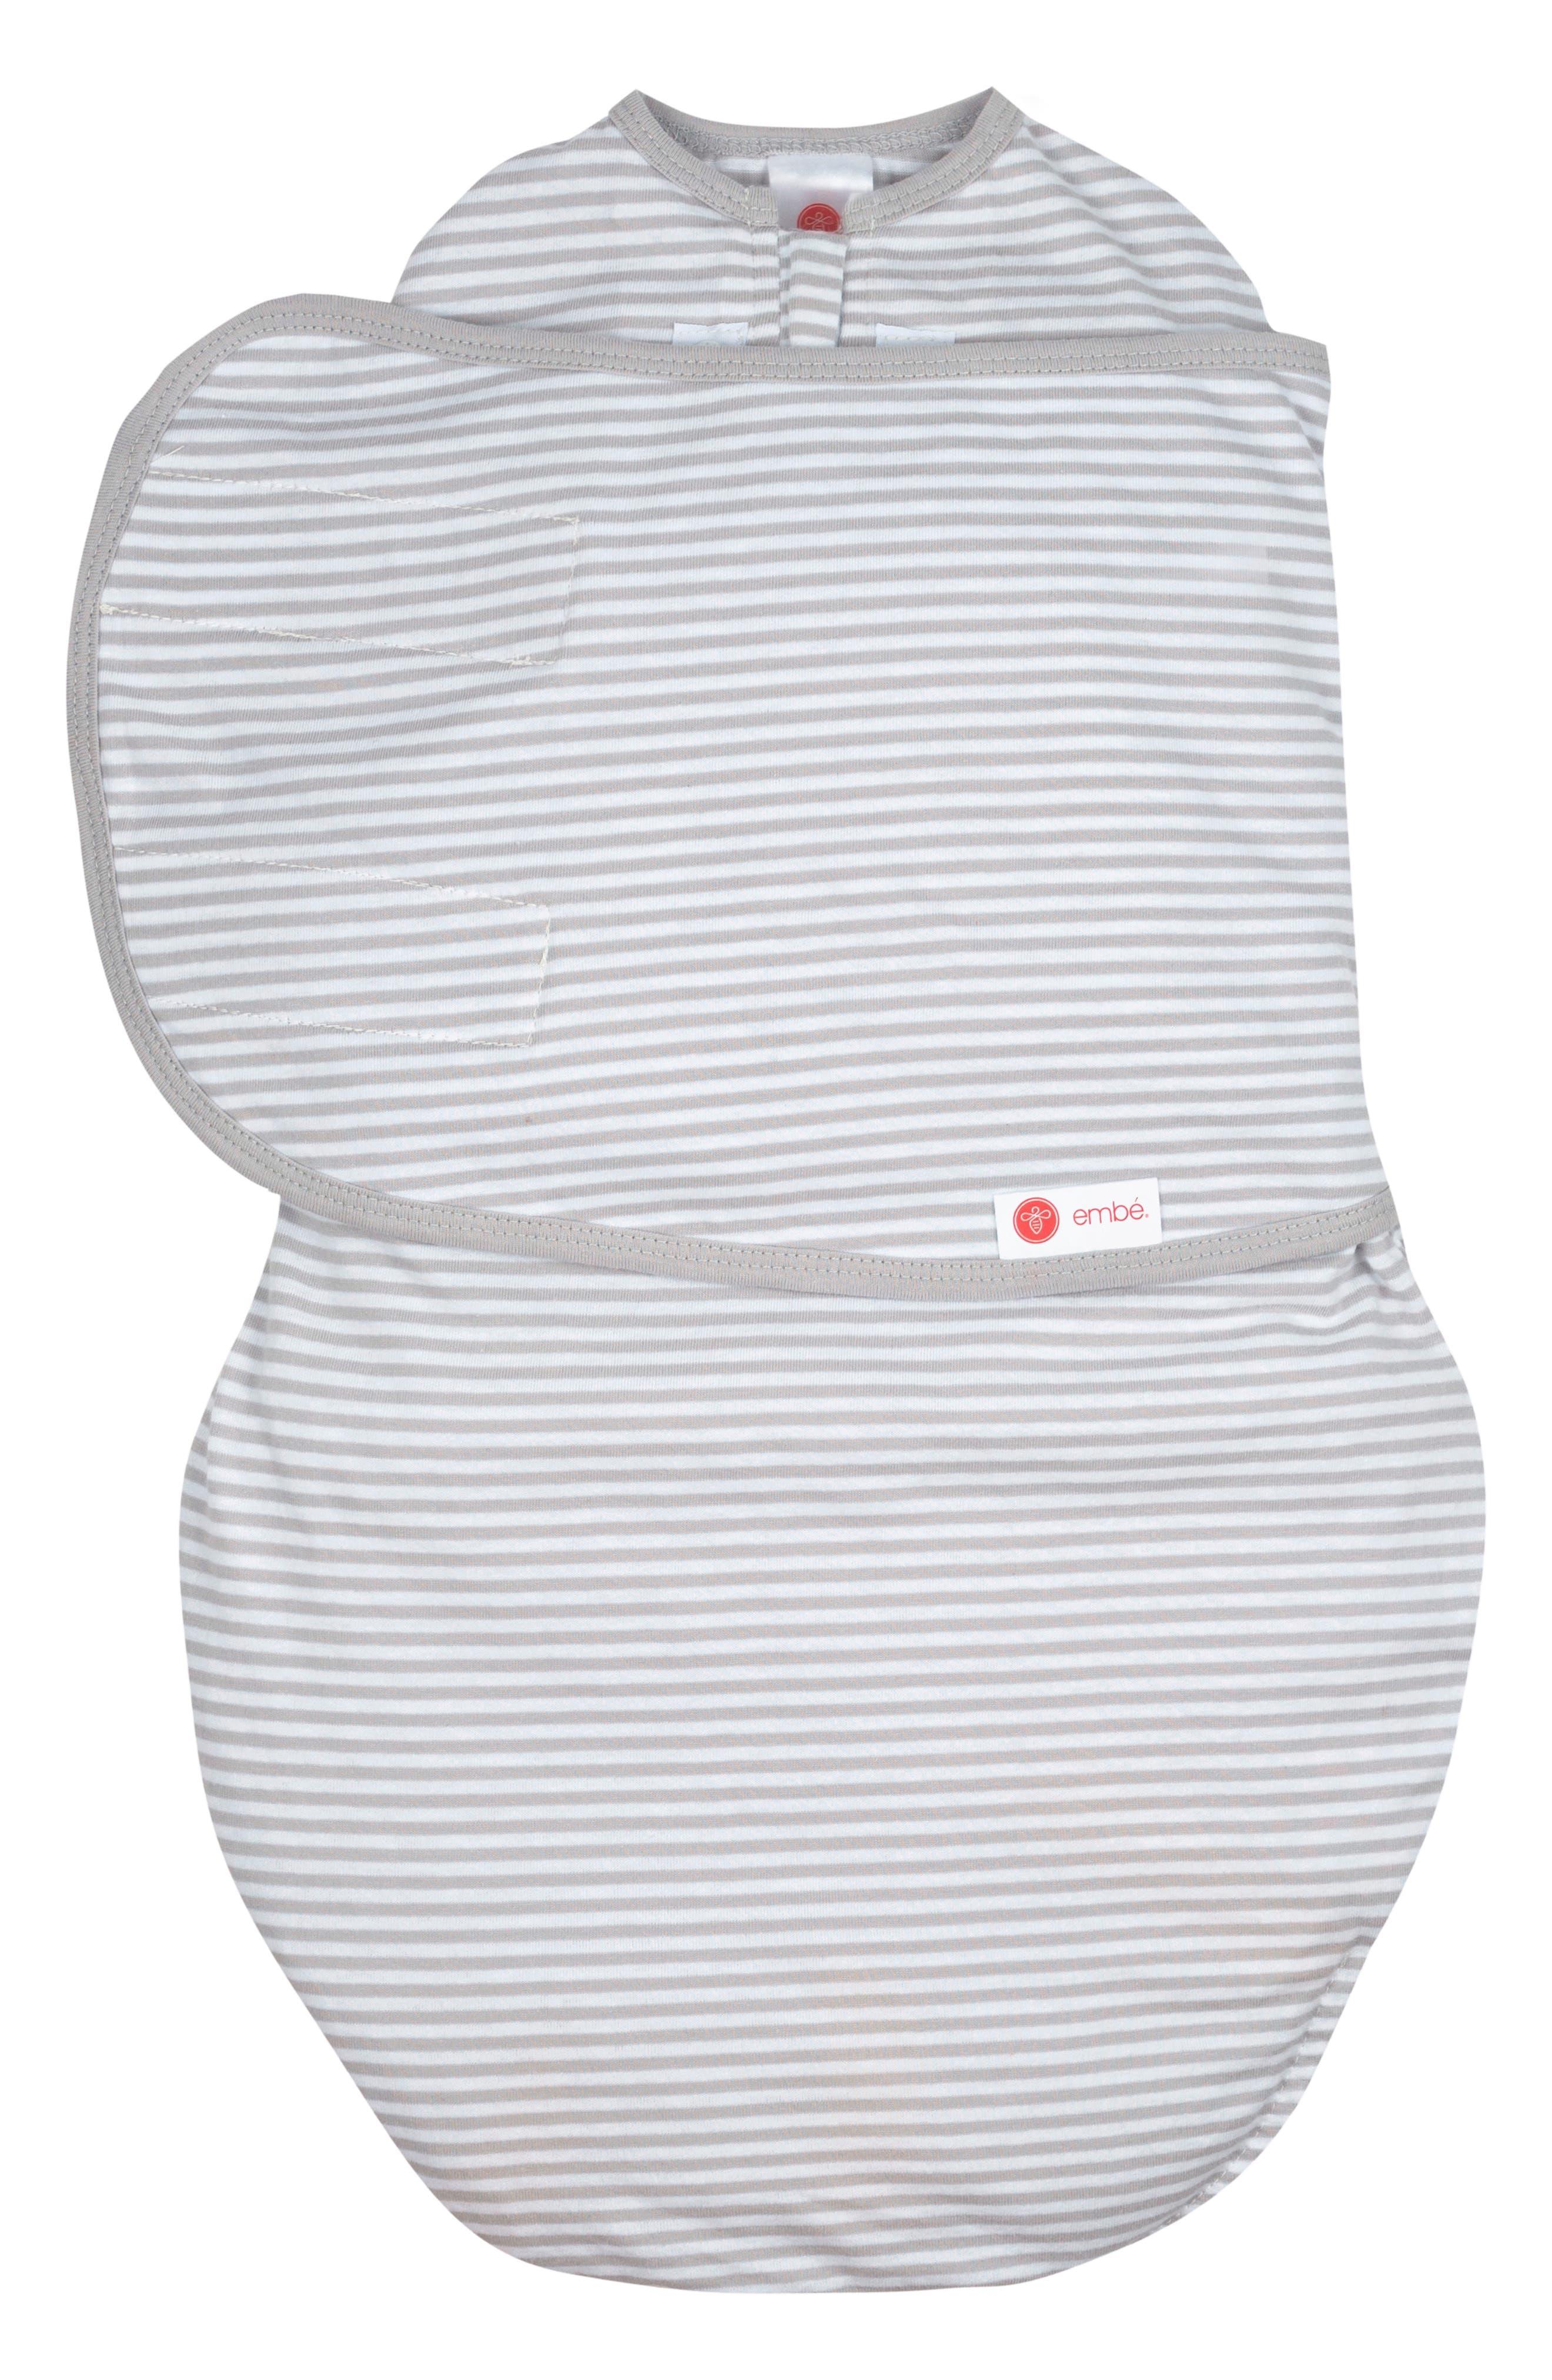 Main Image - embé® 2-Way Swaddle (Baby)